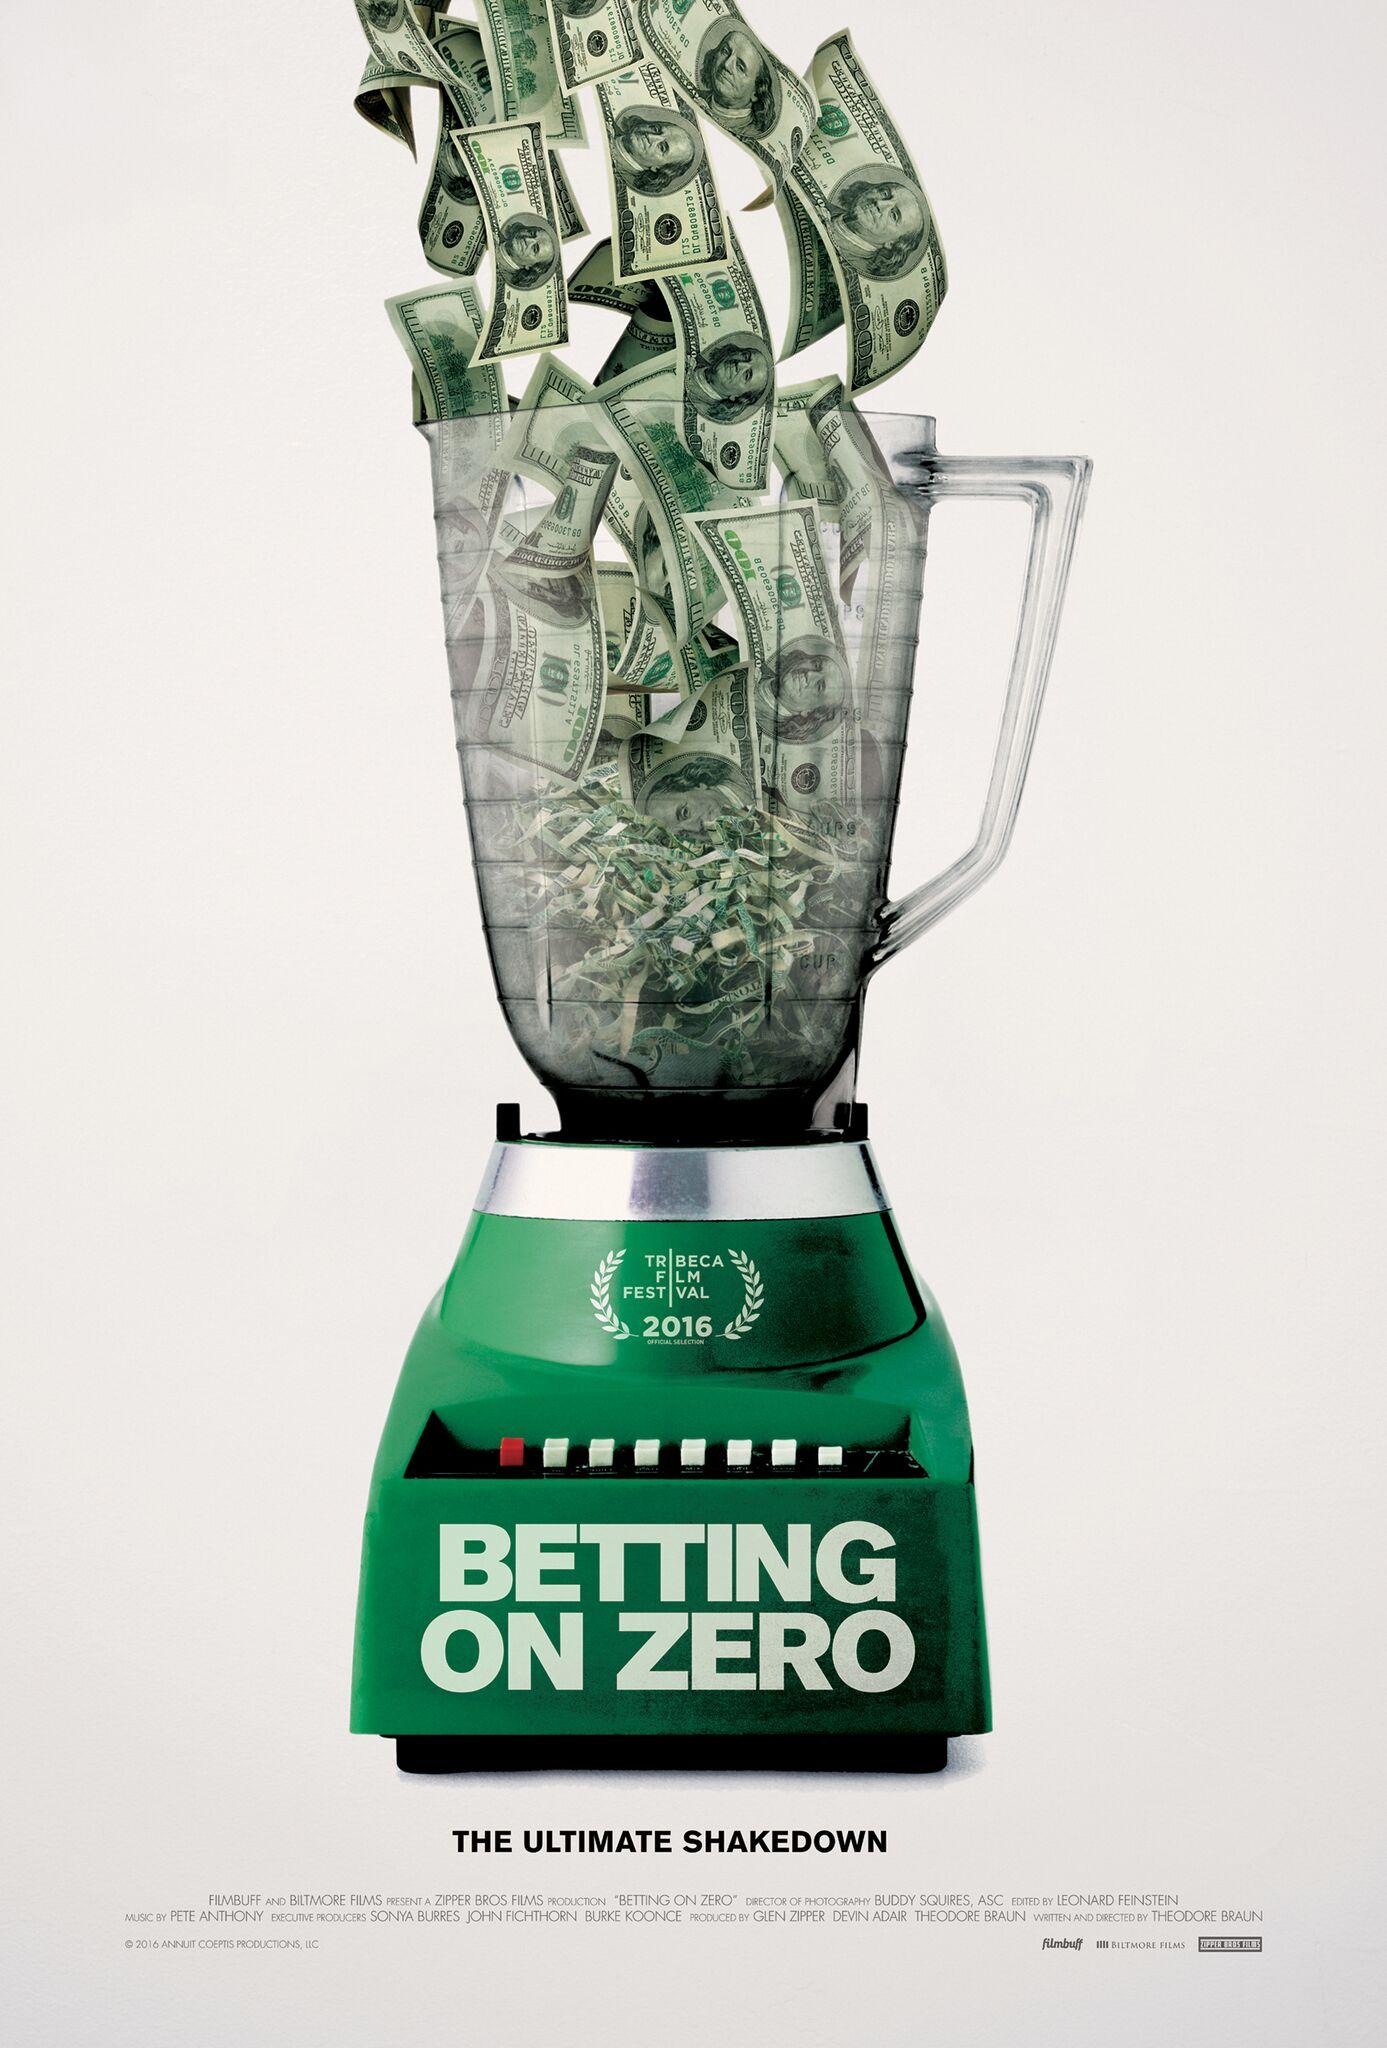 "Mu9gPGbcl8L4b-WO0Hn7VCKOGJ_oAJcgrUeQRd3zPco-2 En estreno, ""Betting on Zero"""